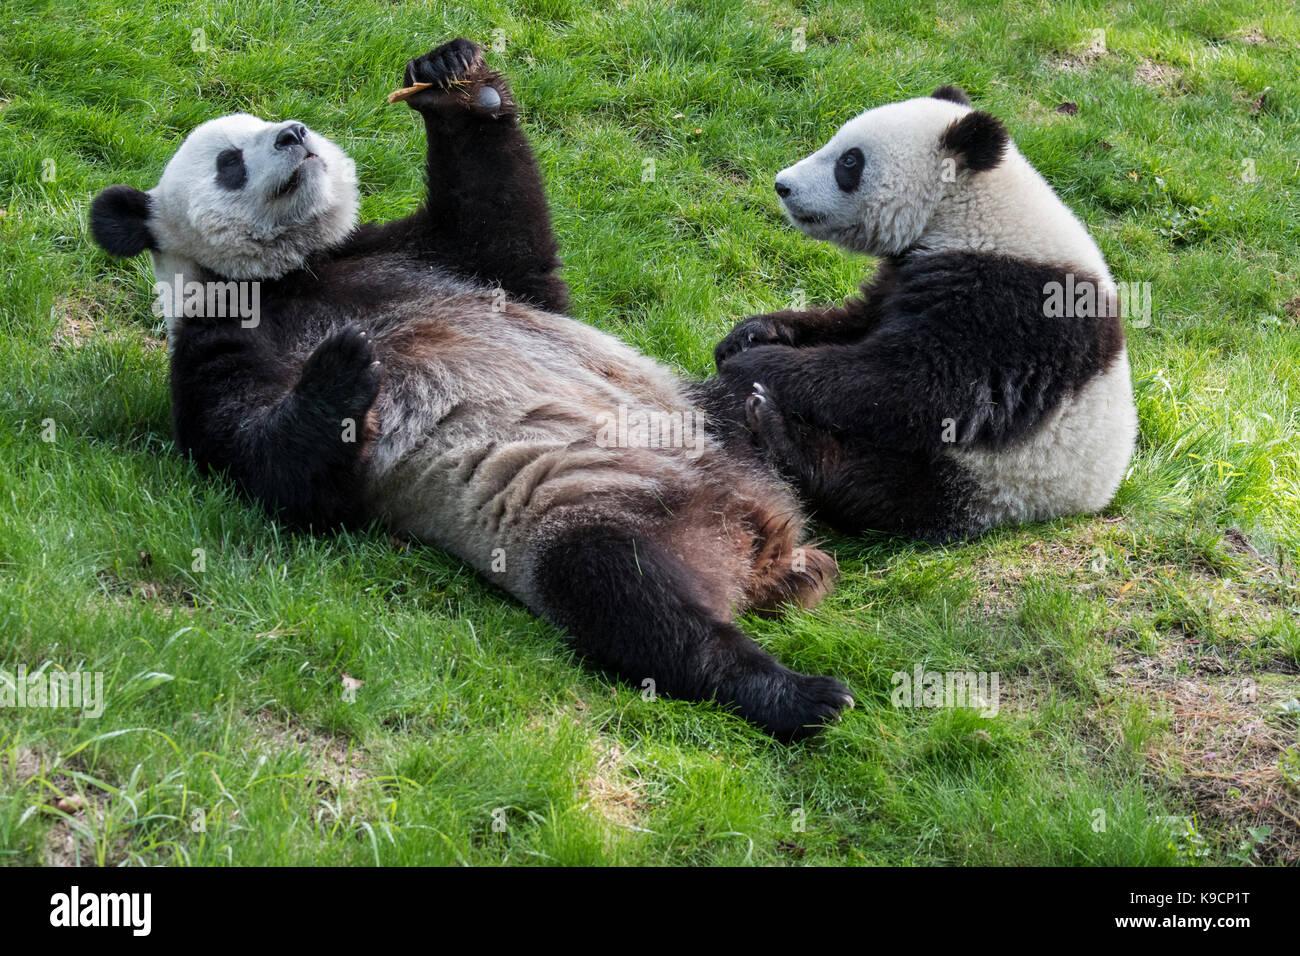 Young giant panda (Ailuropoda melanoleuca) watching mother eating cookie in zoo Stock Photo